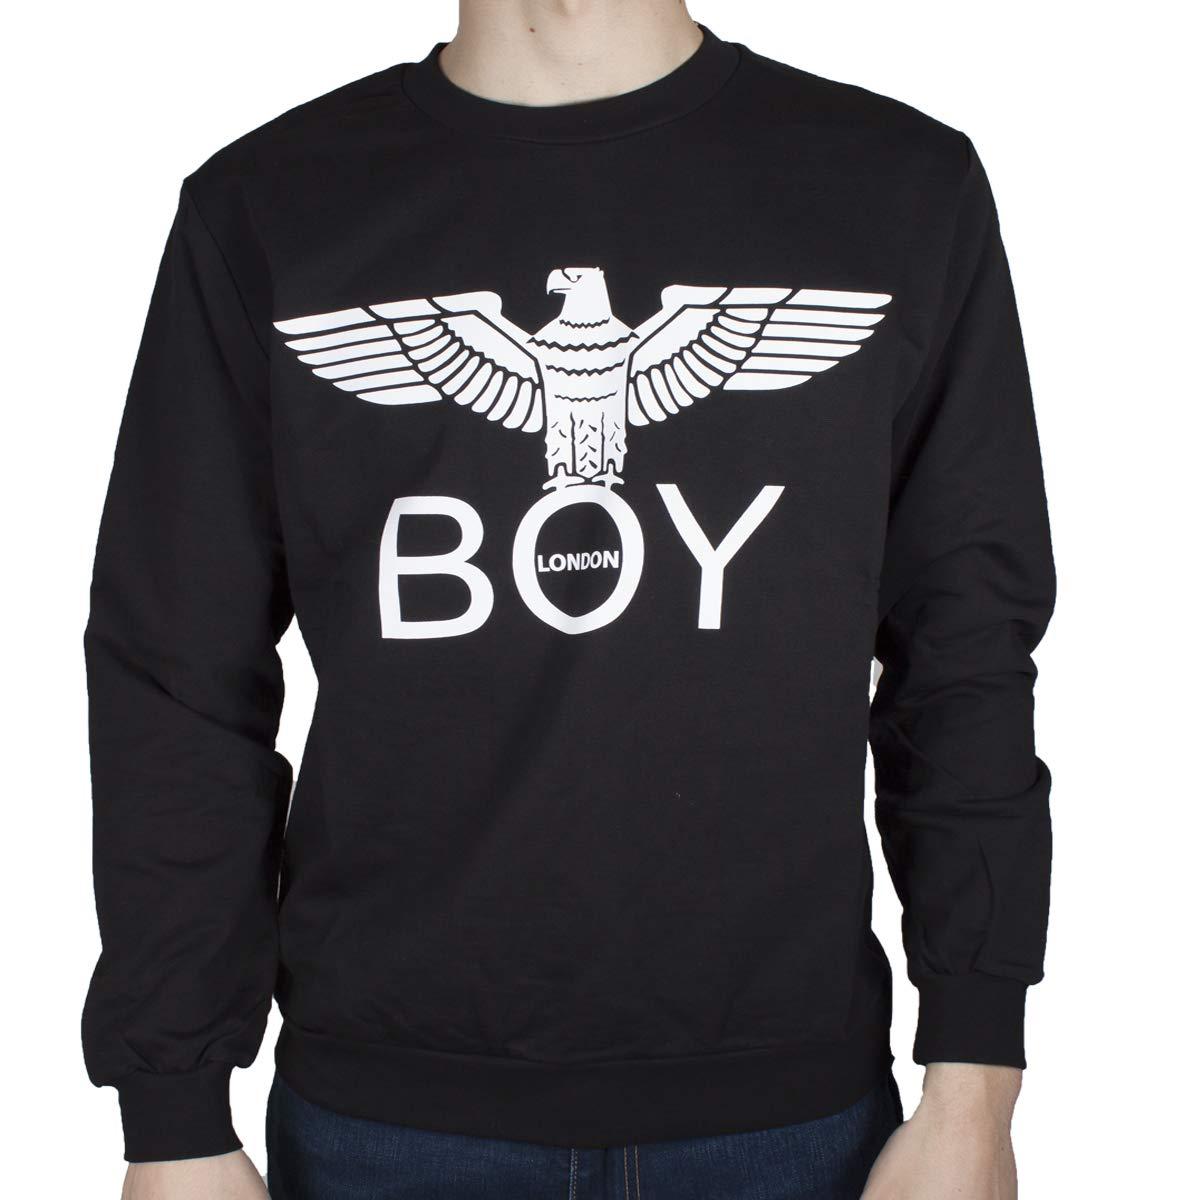 Boy London Felpa Uomo Nero Girocollo Stampa con Logo BLU6005